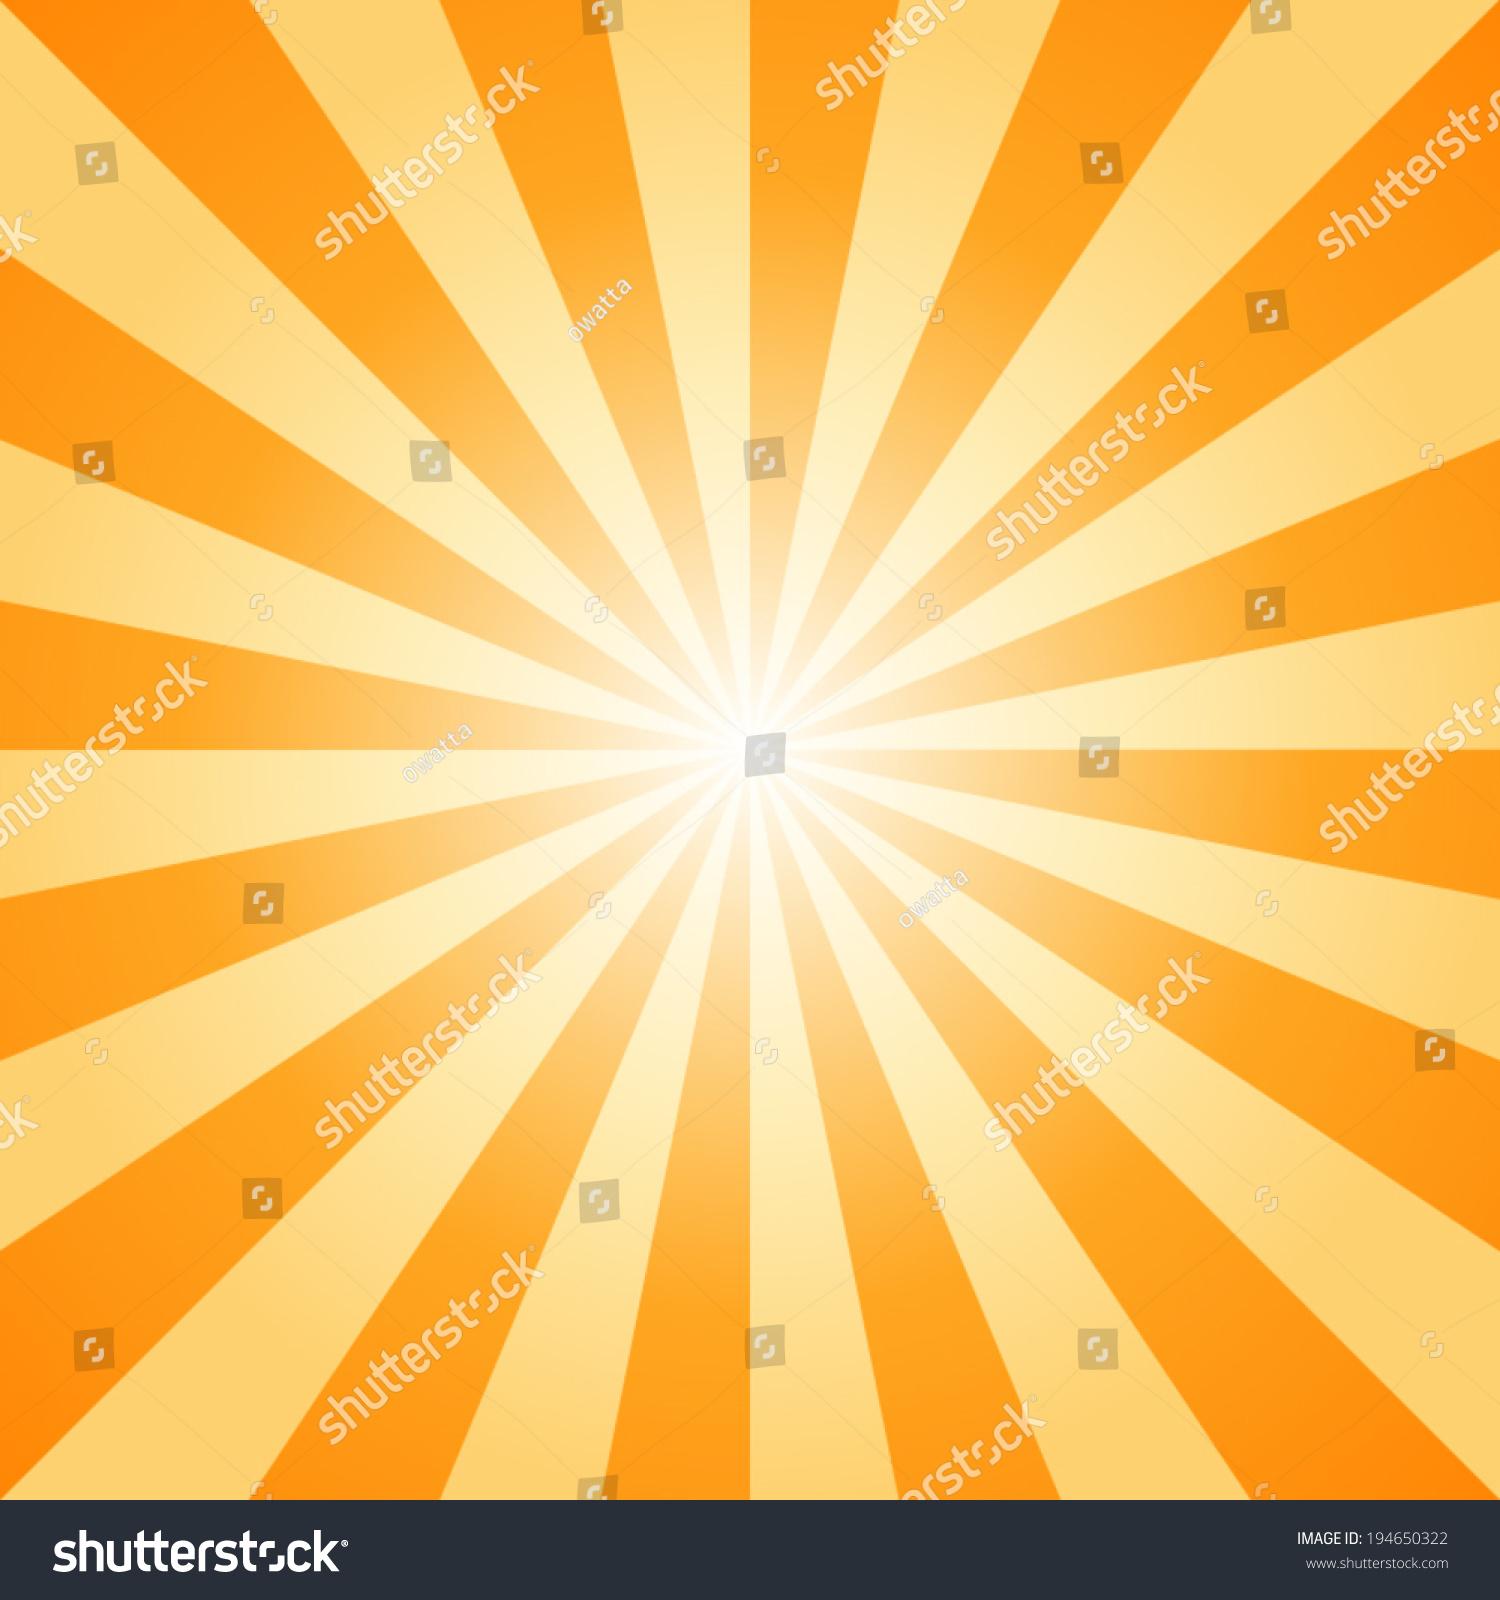 Sunburst Orange Light Ray Vector Illustration Stock Vector ...